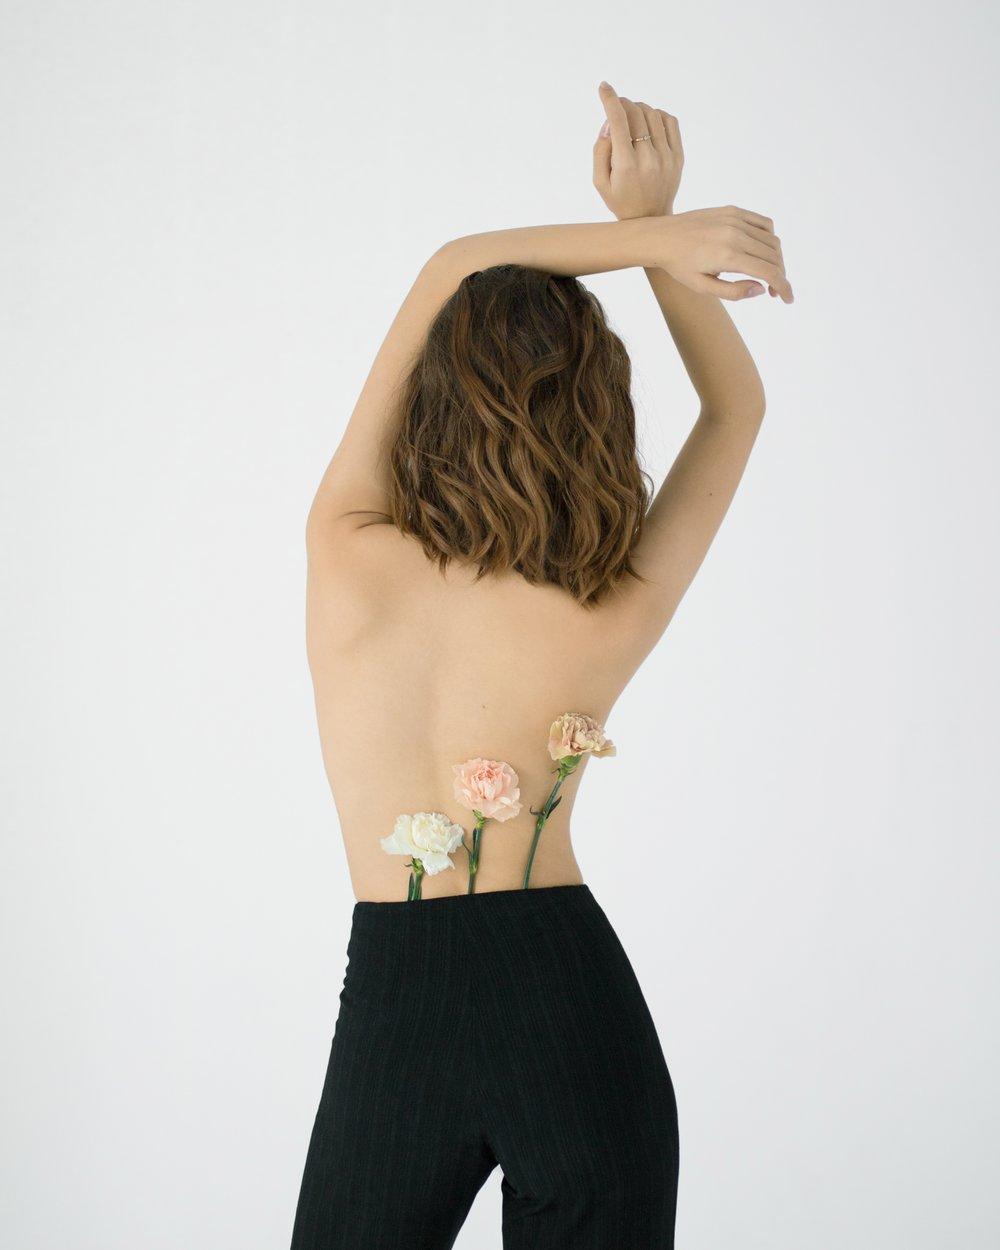 Image:    Aiony Haust    on    Unsplash